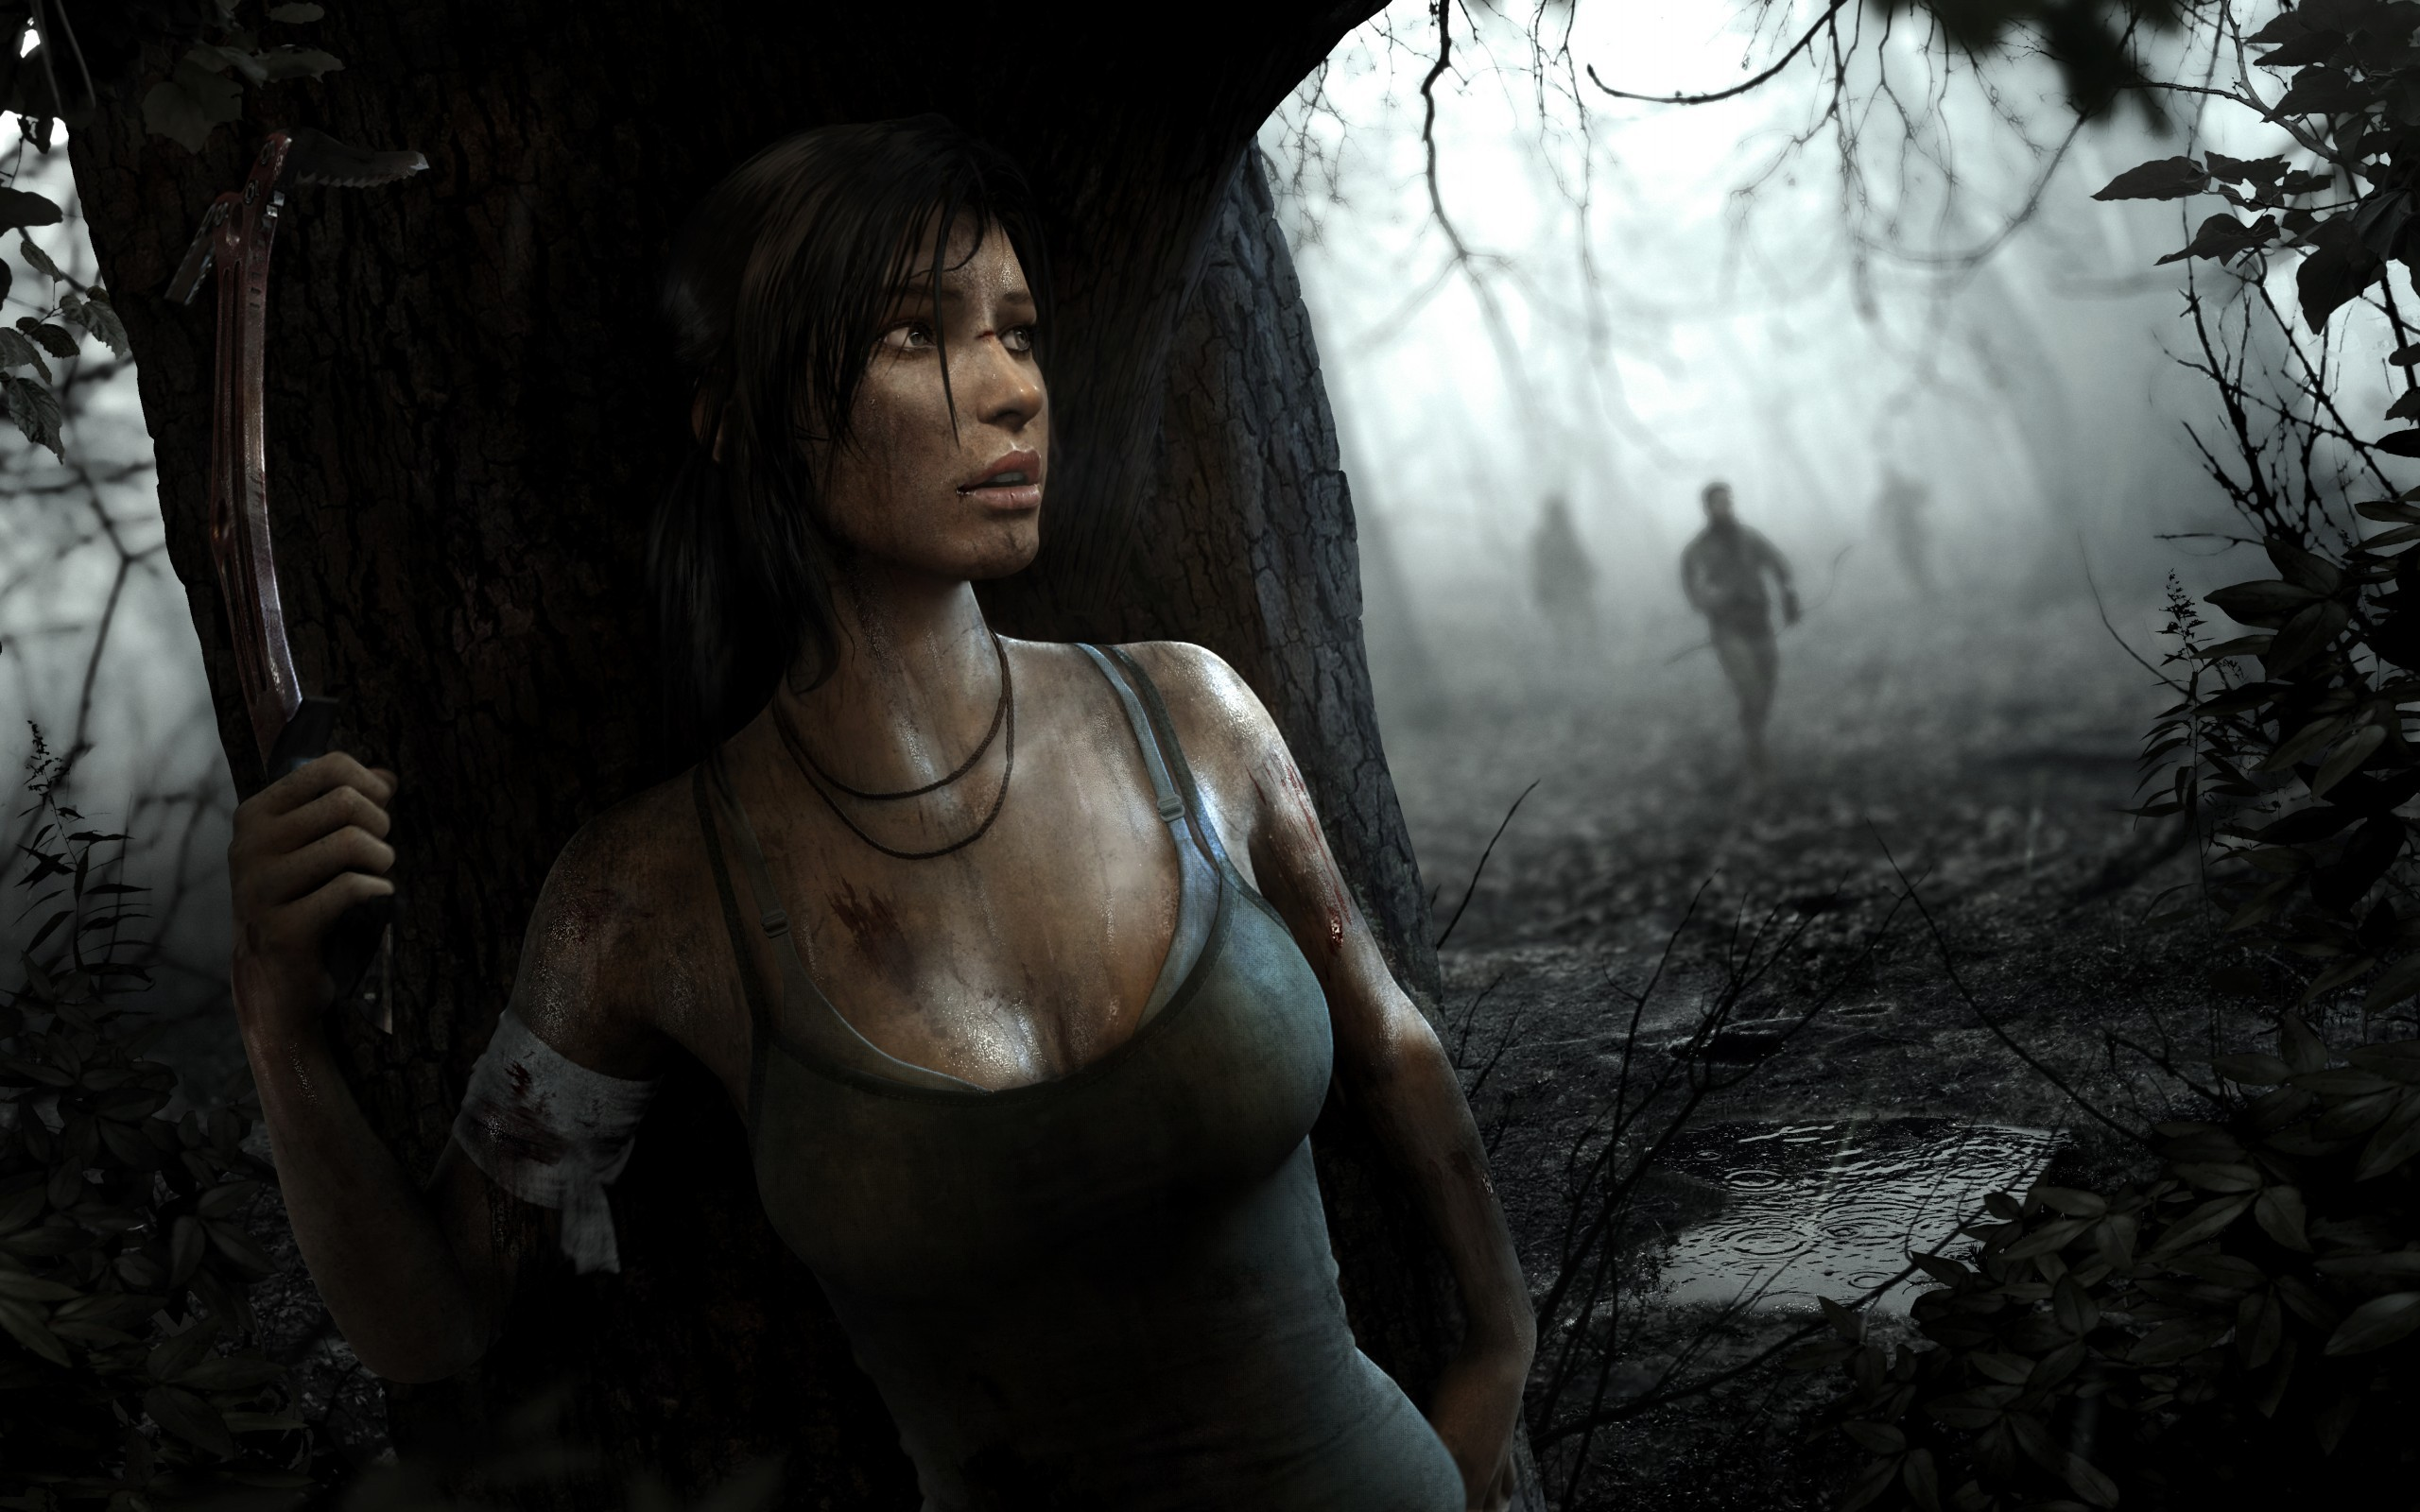 Tomb Raider Lara Croft Wallpaper 2560x1600 67851 Wallpaperup